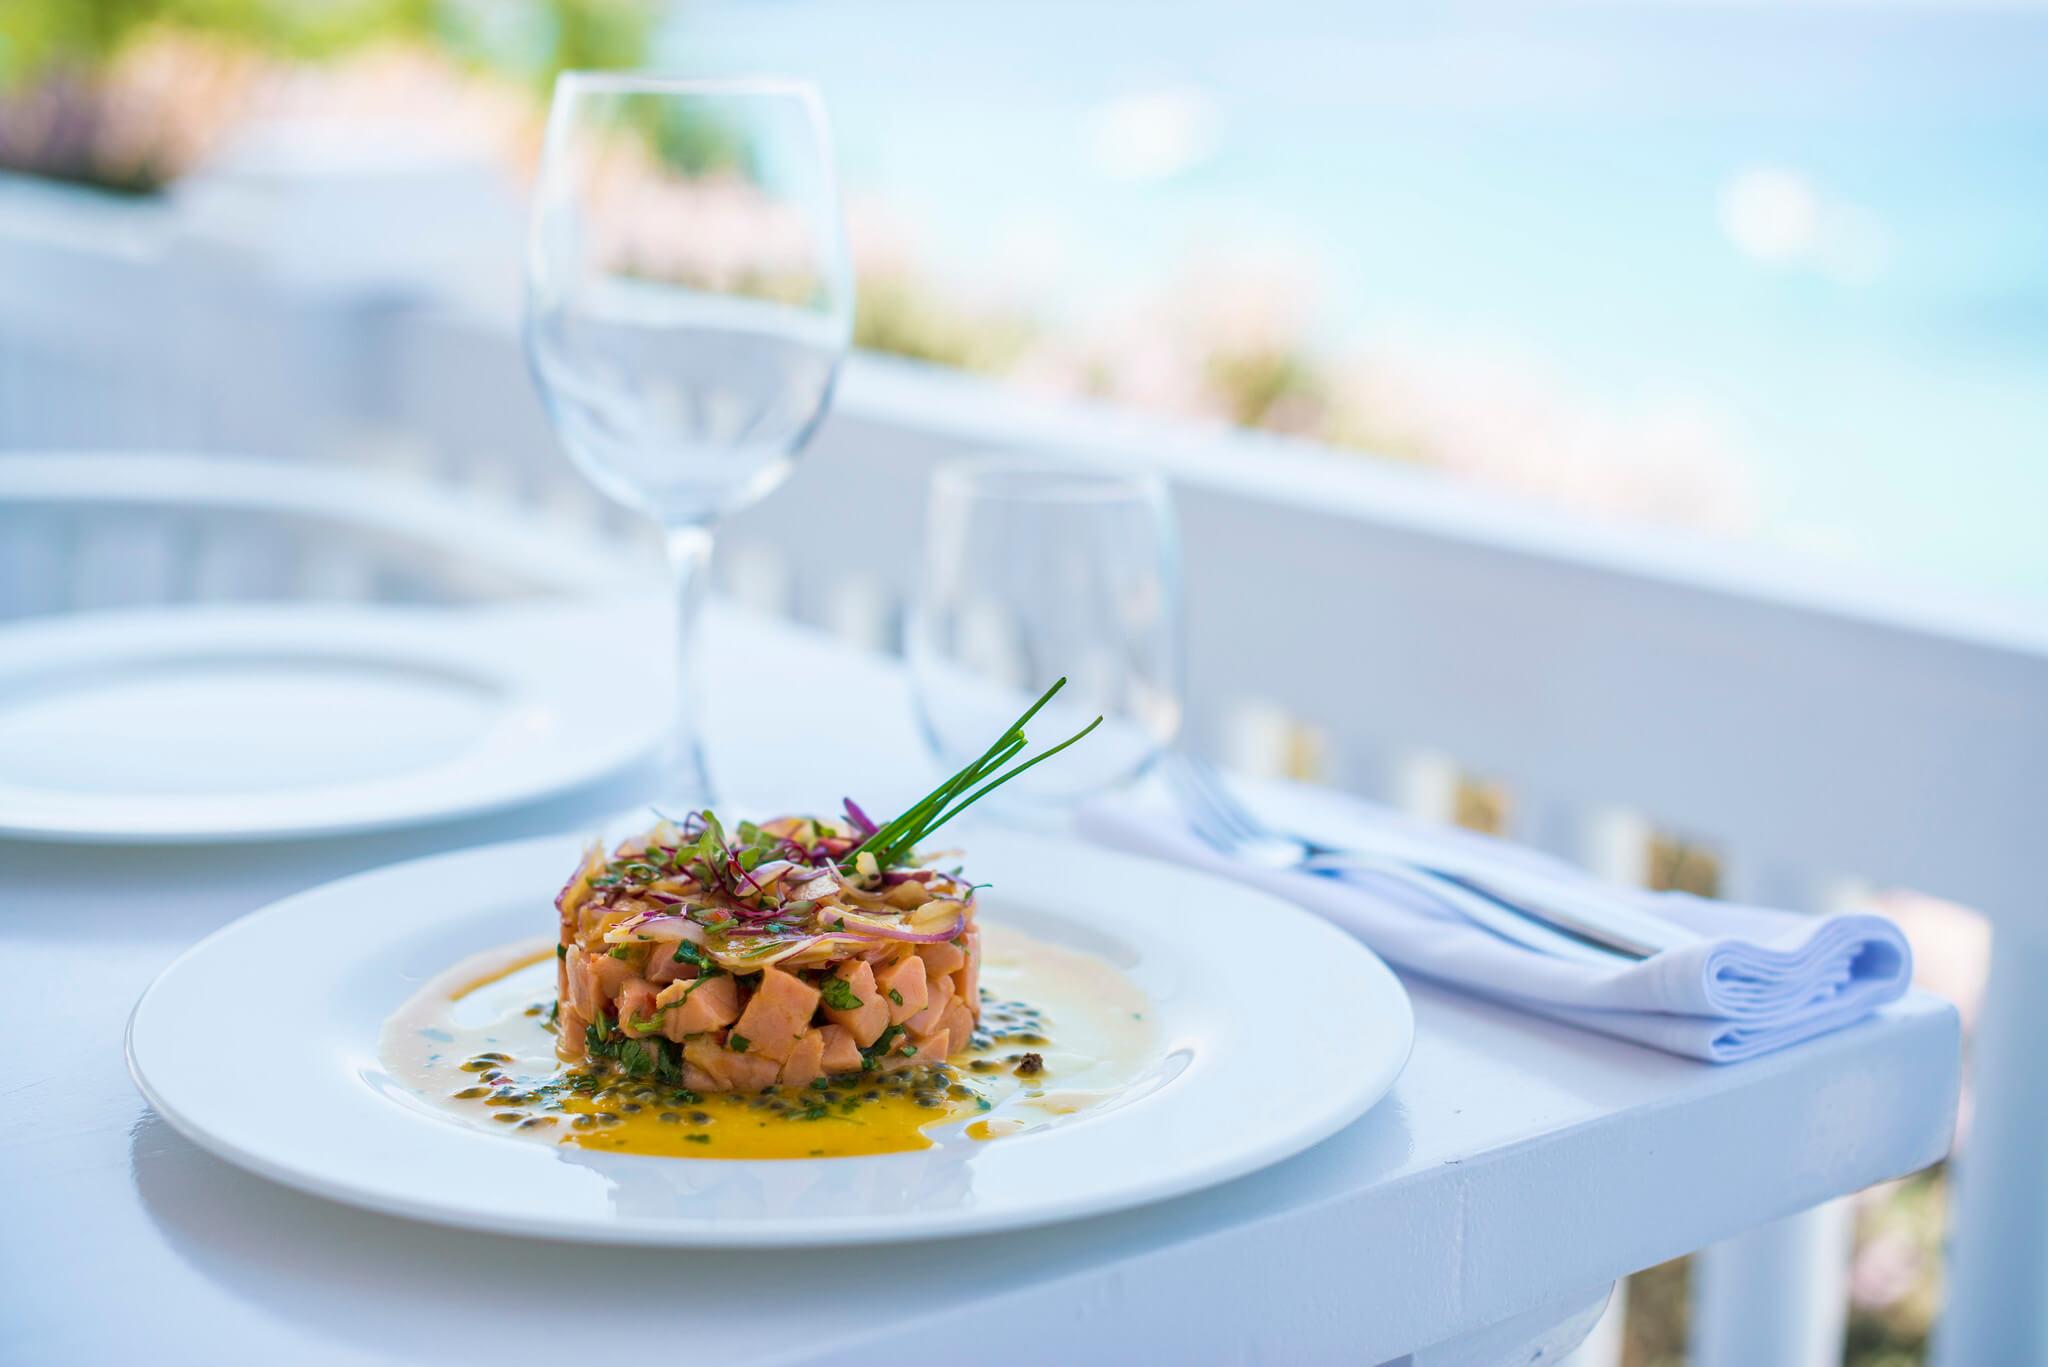 https://www.white-ibiza.com/wp-content/uploads/2020/03/ibiza-beach-restaurant-cotton-beach-club-2020-08.jpg